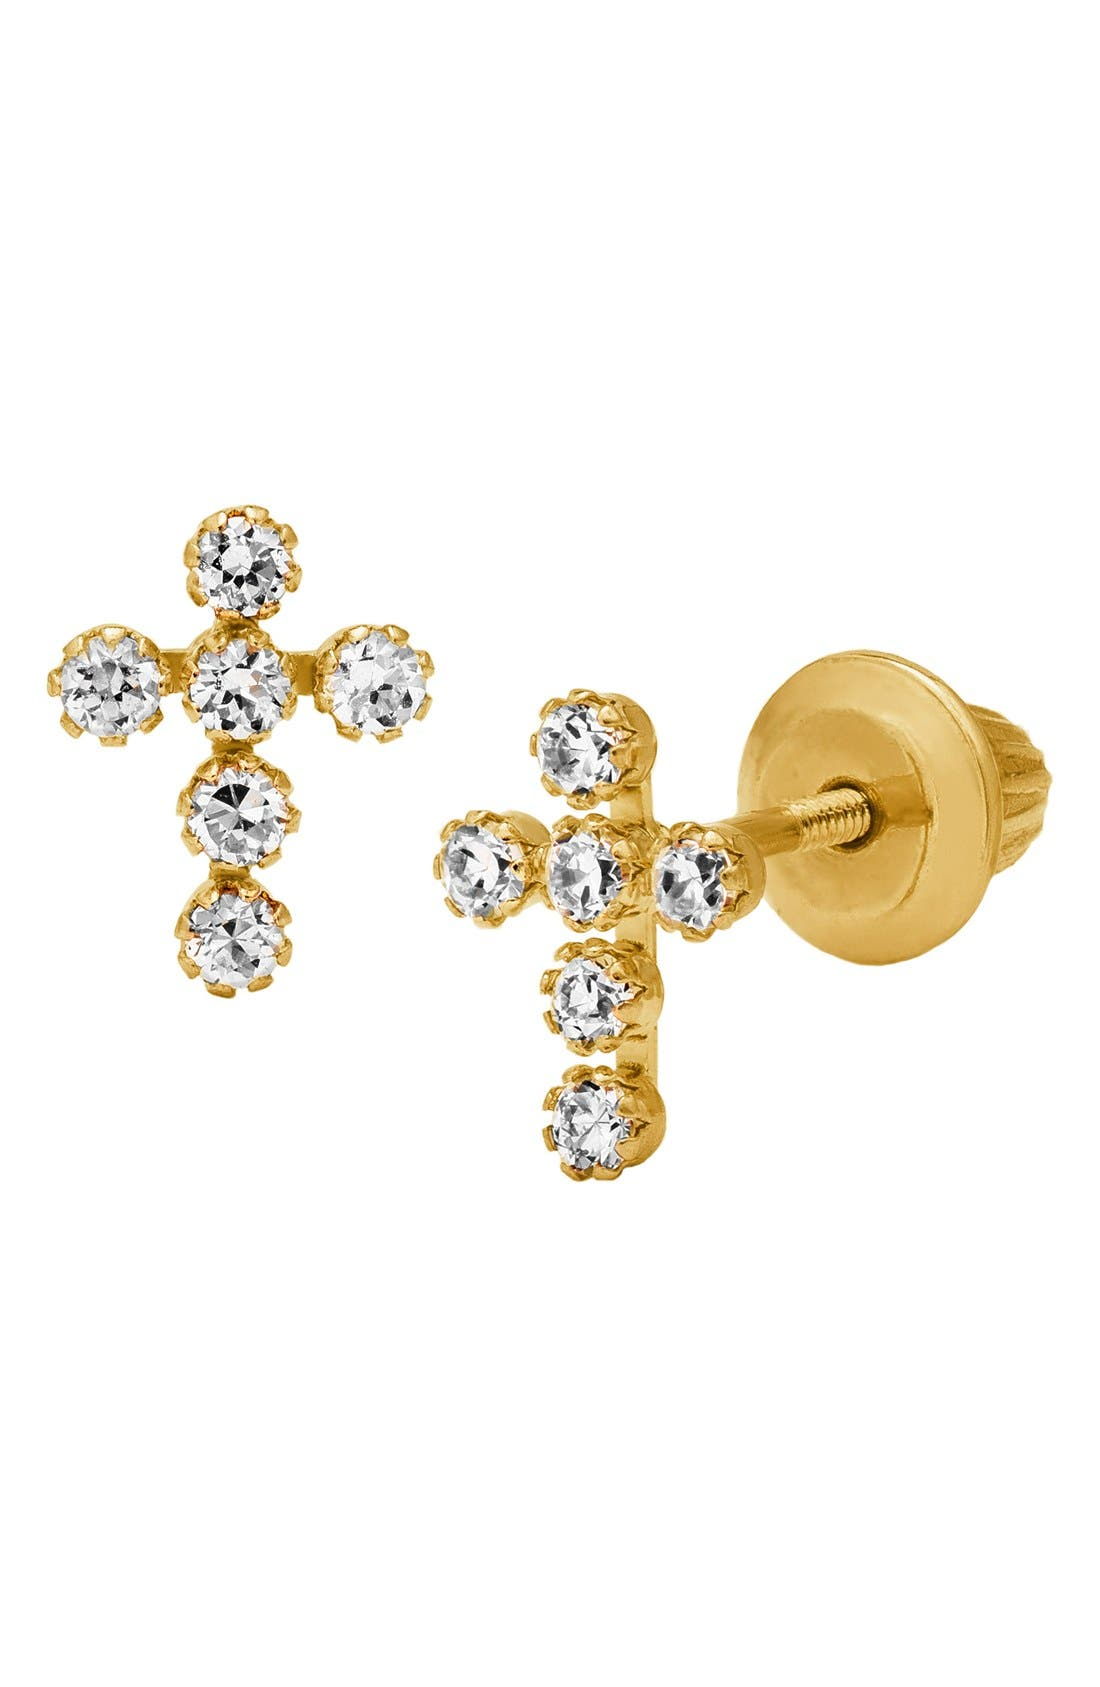 14k Gold & Cubic Zirconia Cross Earrings,                             Alternate thumbnail 2, color,                             GOLD